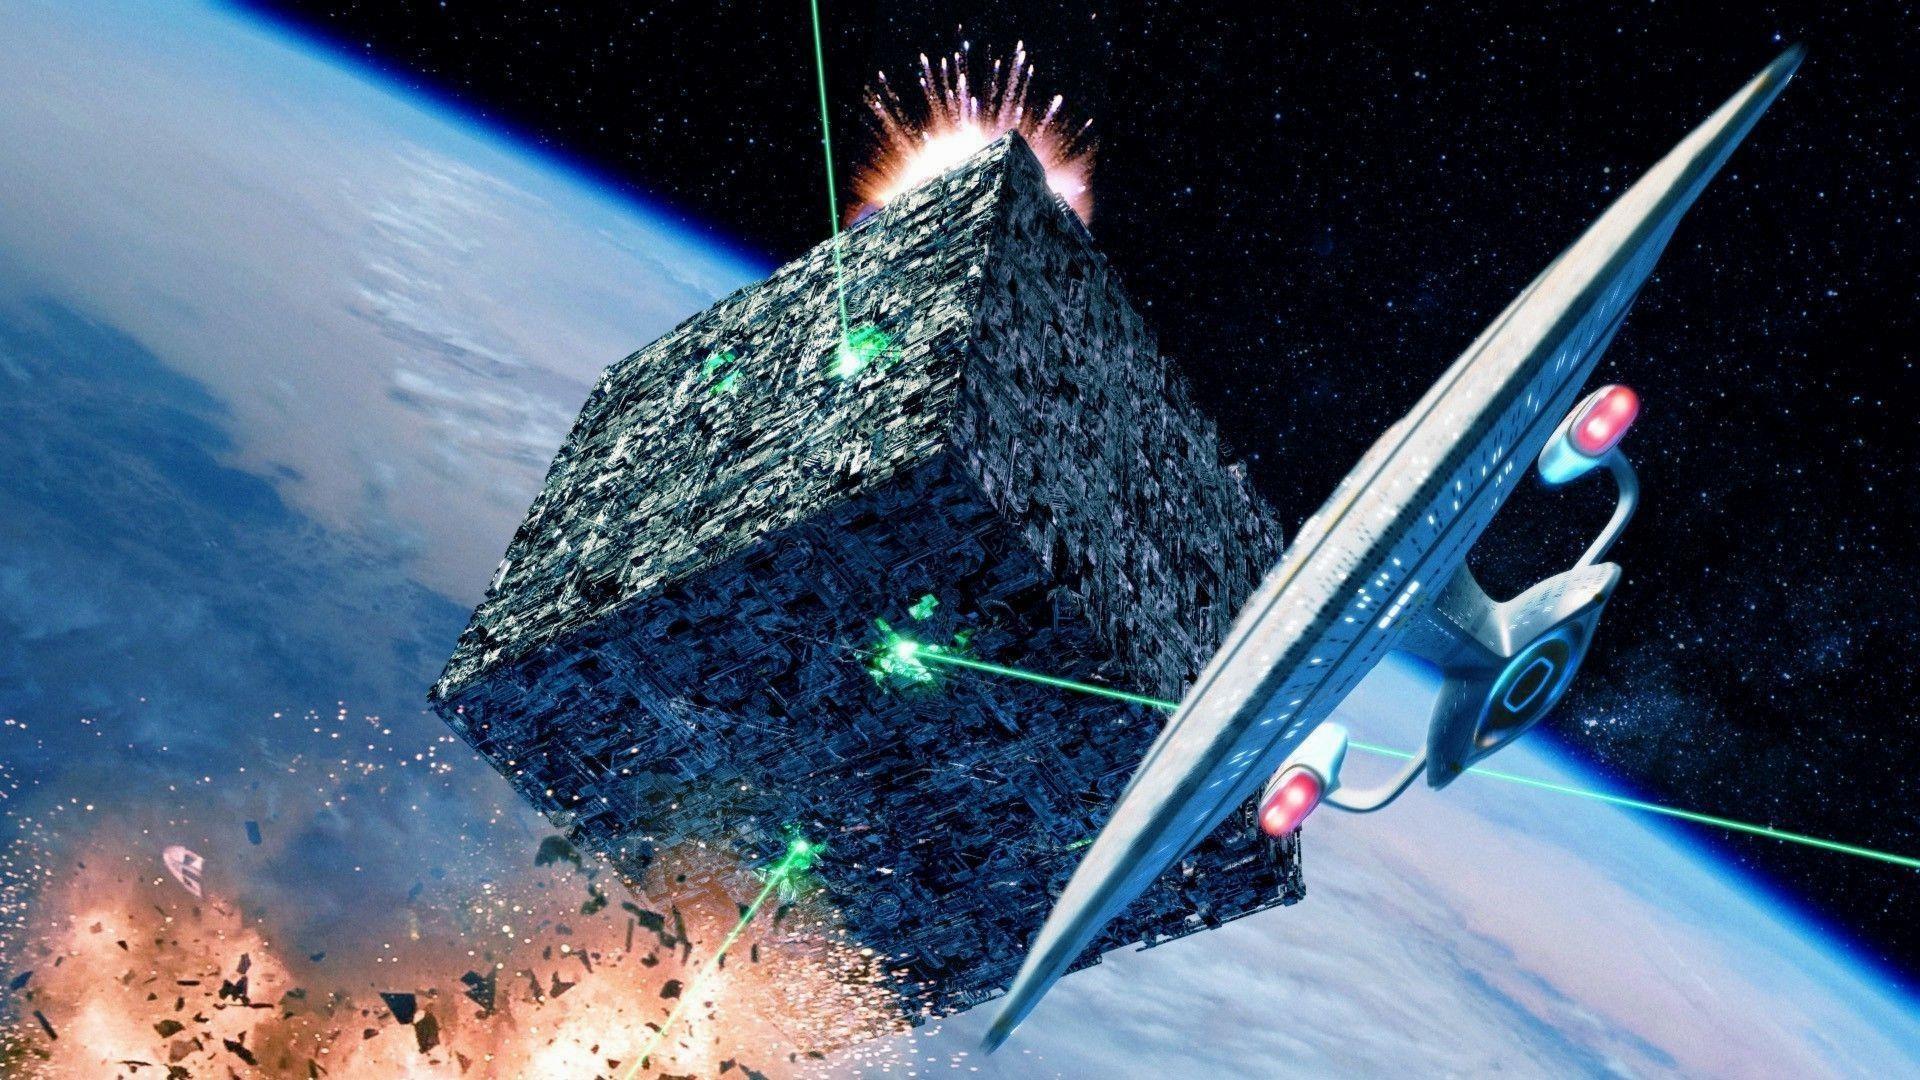 Res: 1920x1080,  wallpaper.wiki-Free-Borg-Star-Trek-Image-PIC